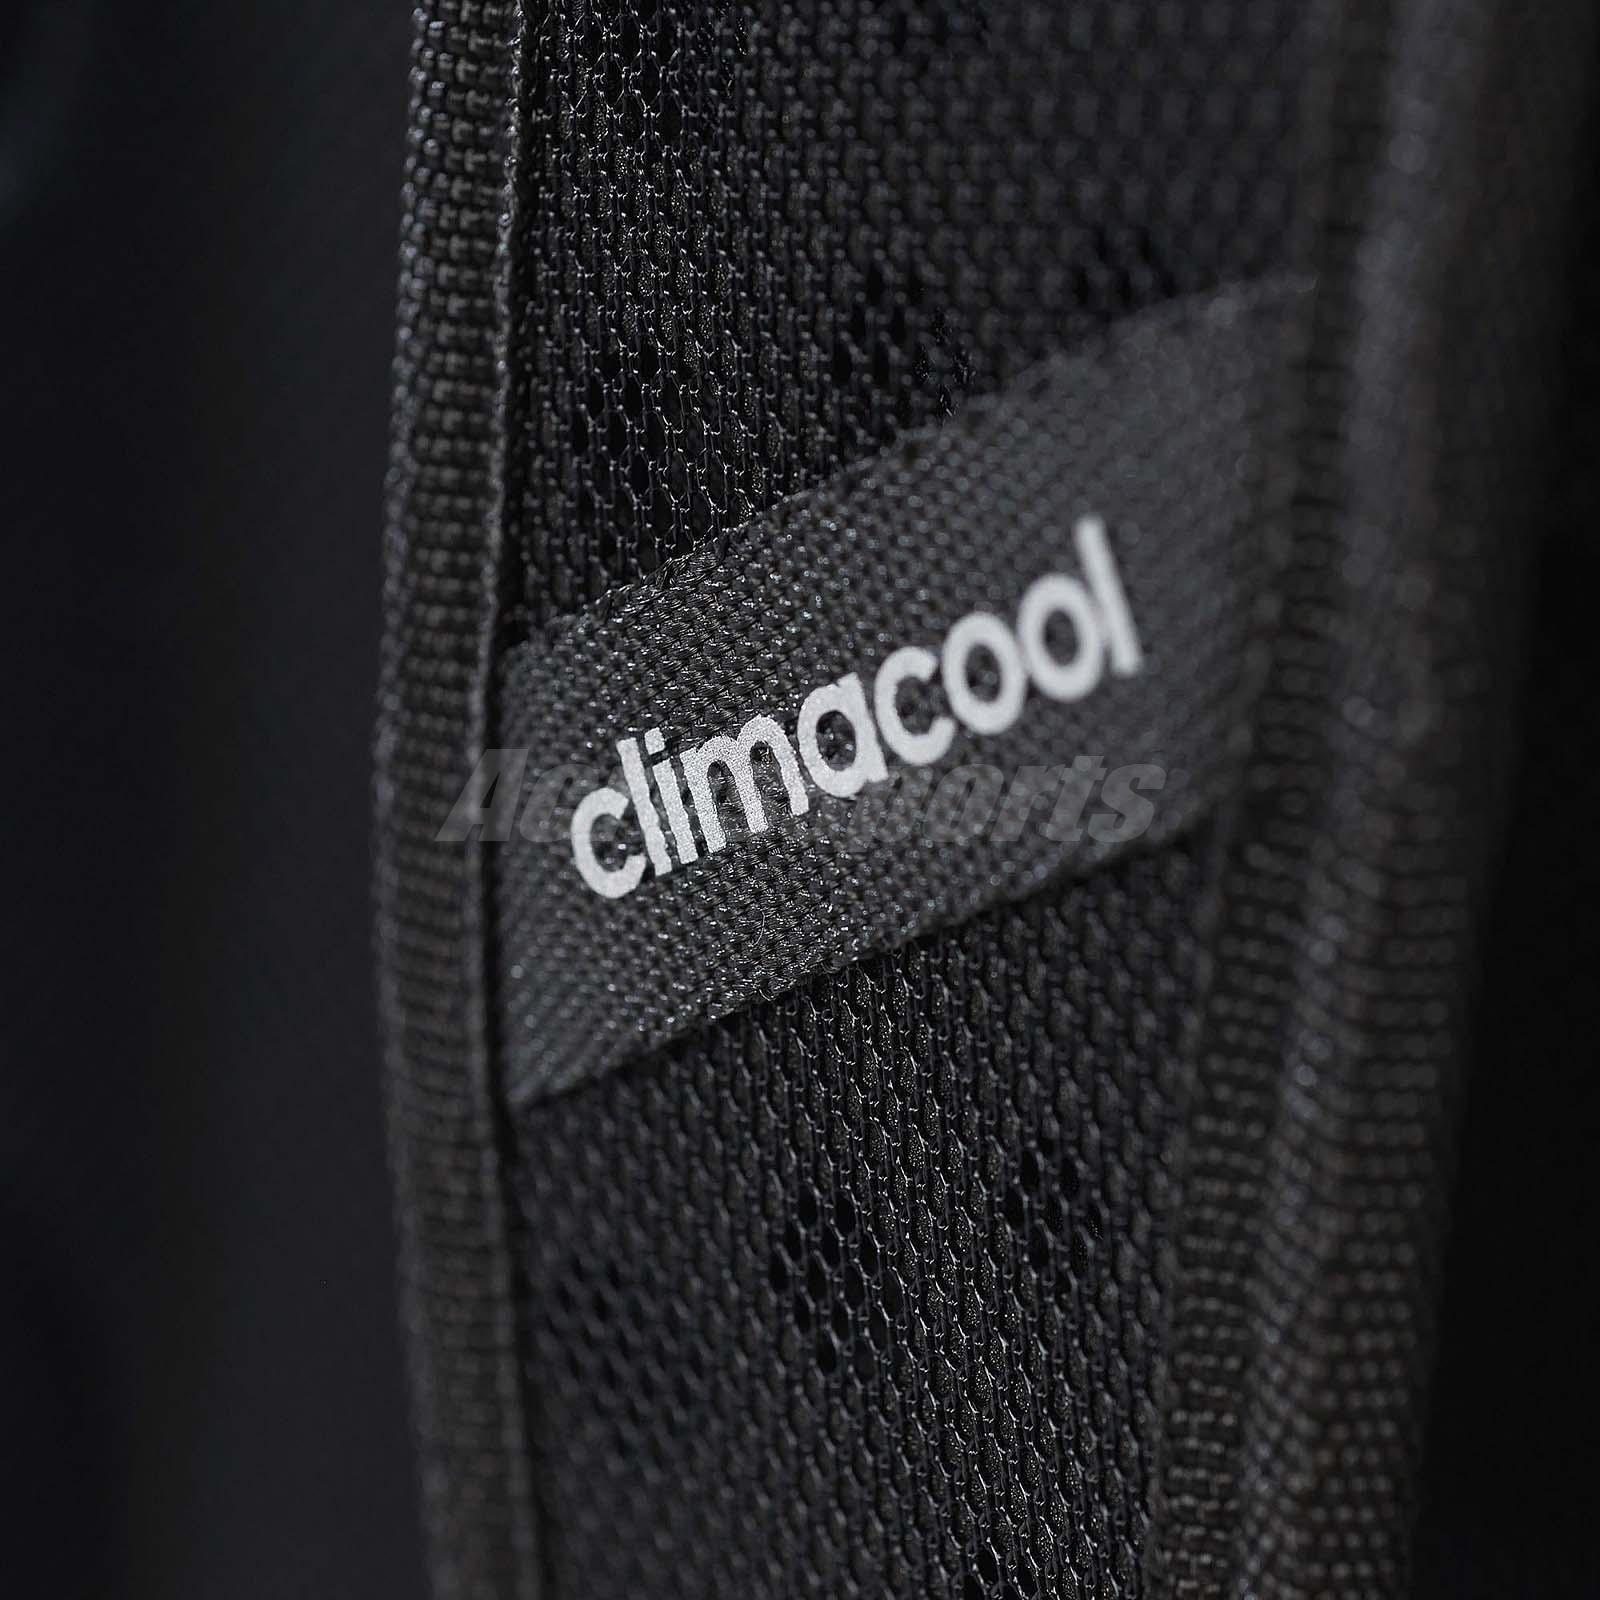 climacool adidas bag